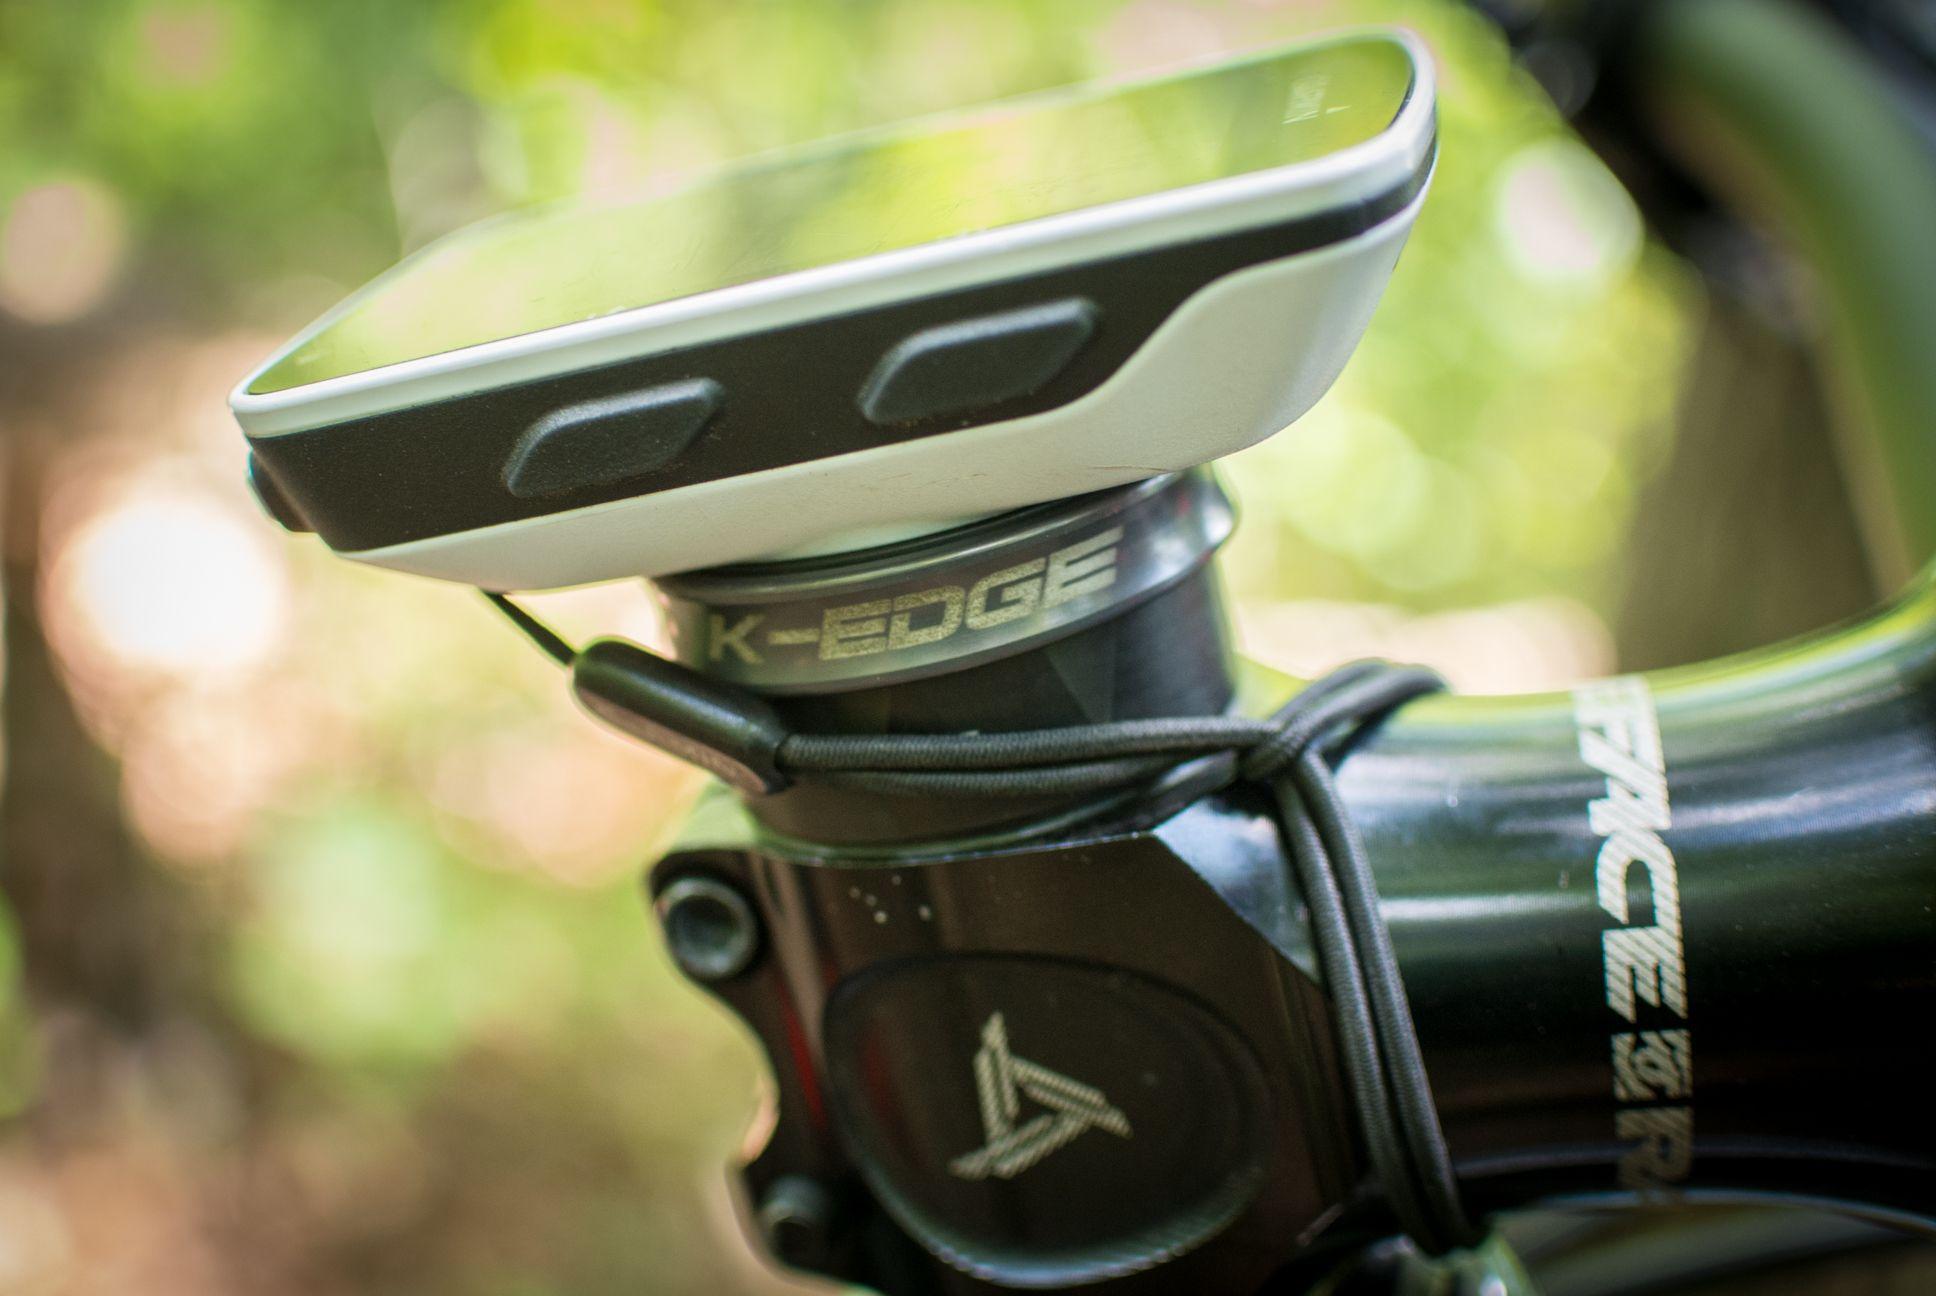 Review KEdge Garmin Mounts Bike news, Mtb, Mountain biking